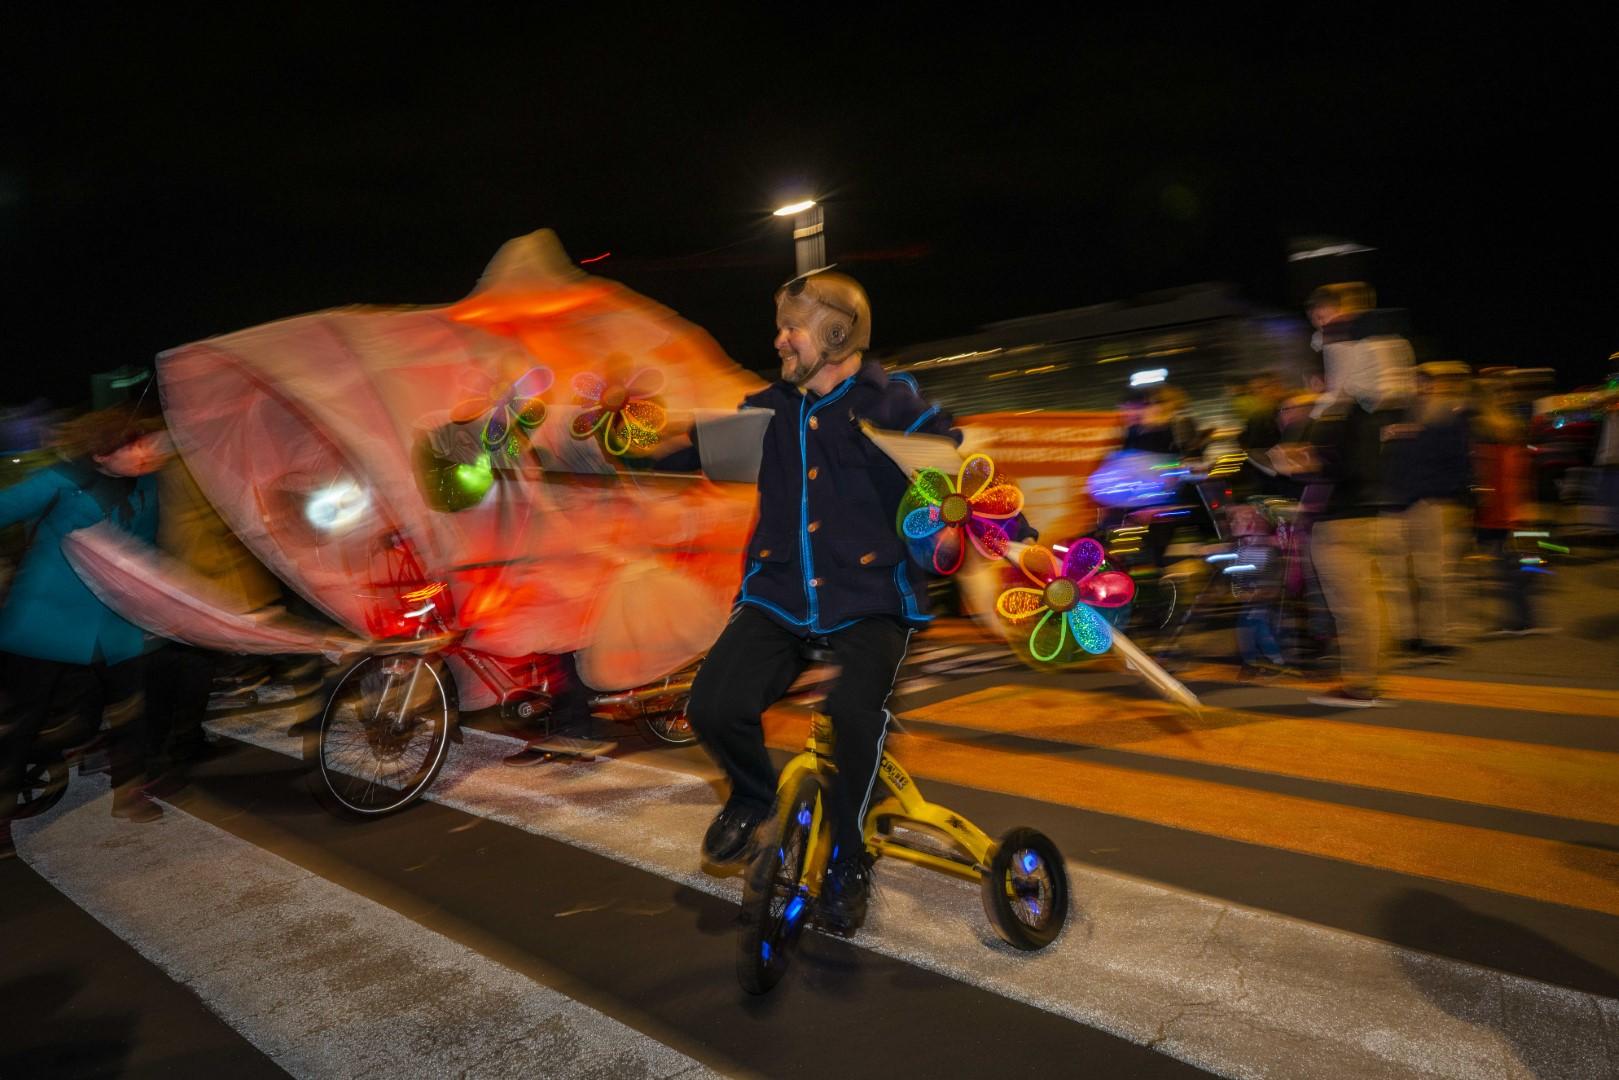 IMM Uni cycle blur 2.61MB photography John McDermott DSC03355 (Large).jpg